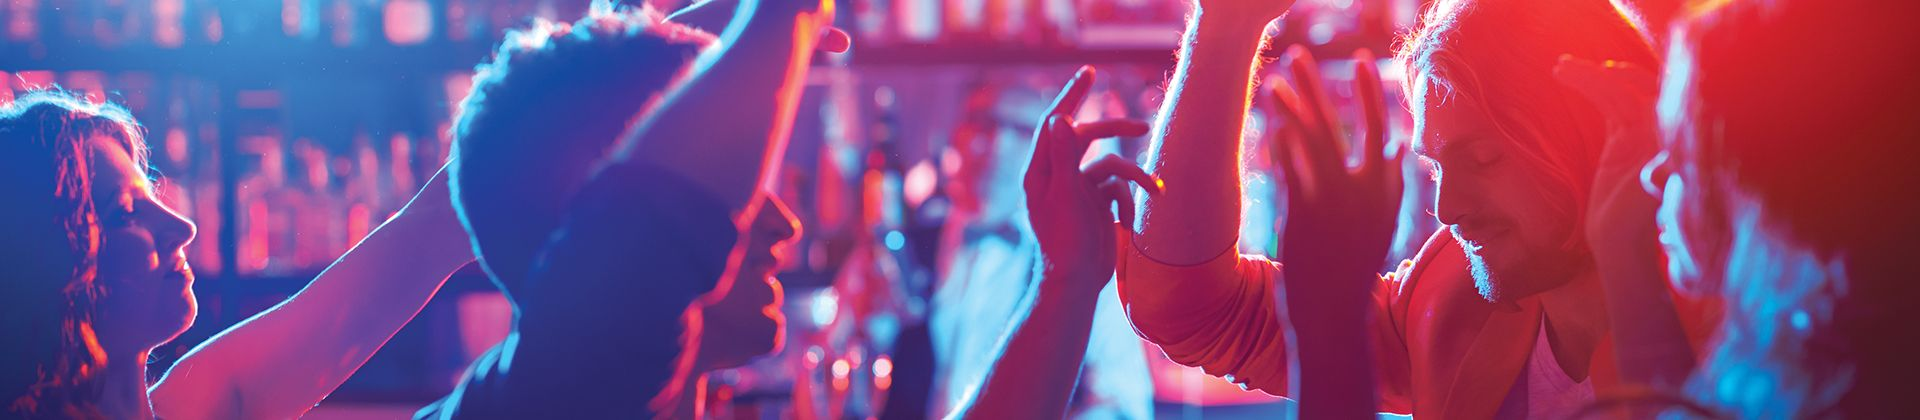 Bruiloft DJ gezocht in omgeving Oosterhout? | Music2Party2